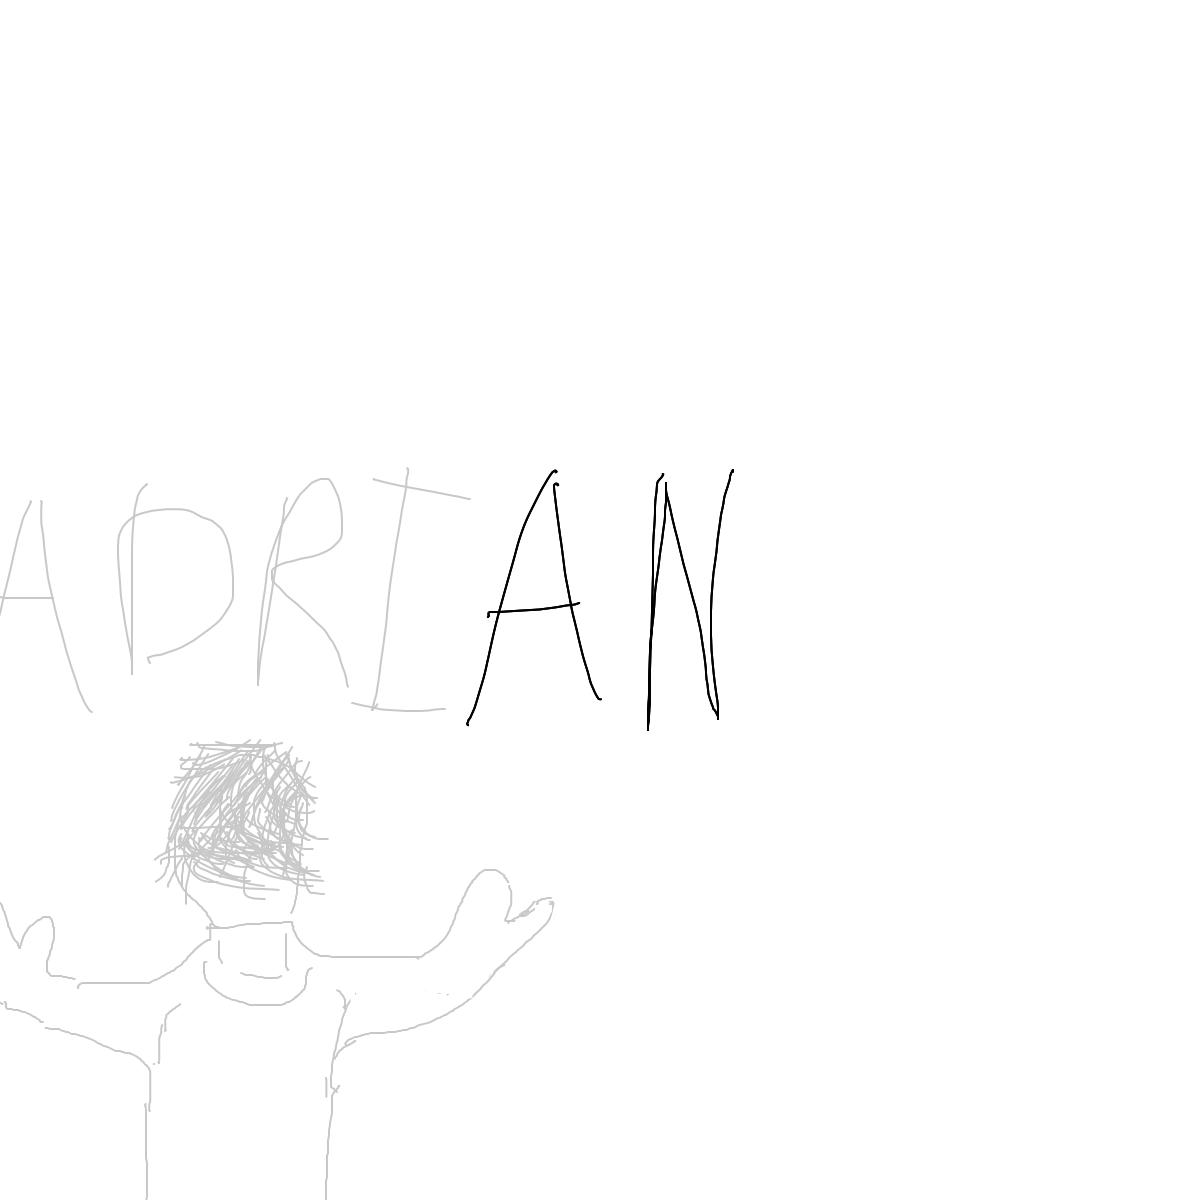 BAAAM drawing#5273 lat:39.9656066894531250lng: -75.1809005737304700